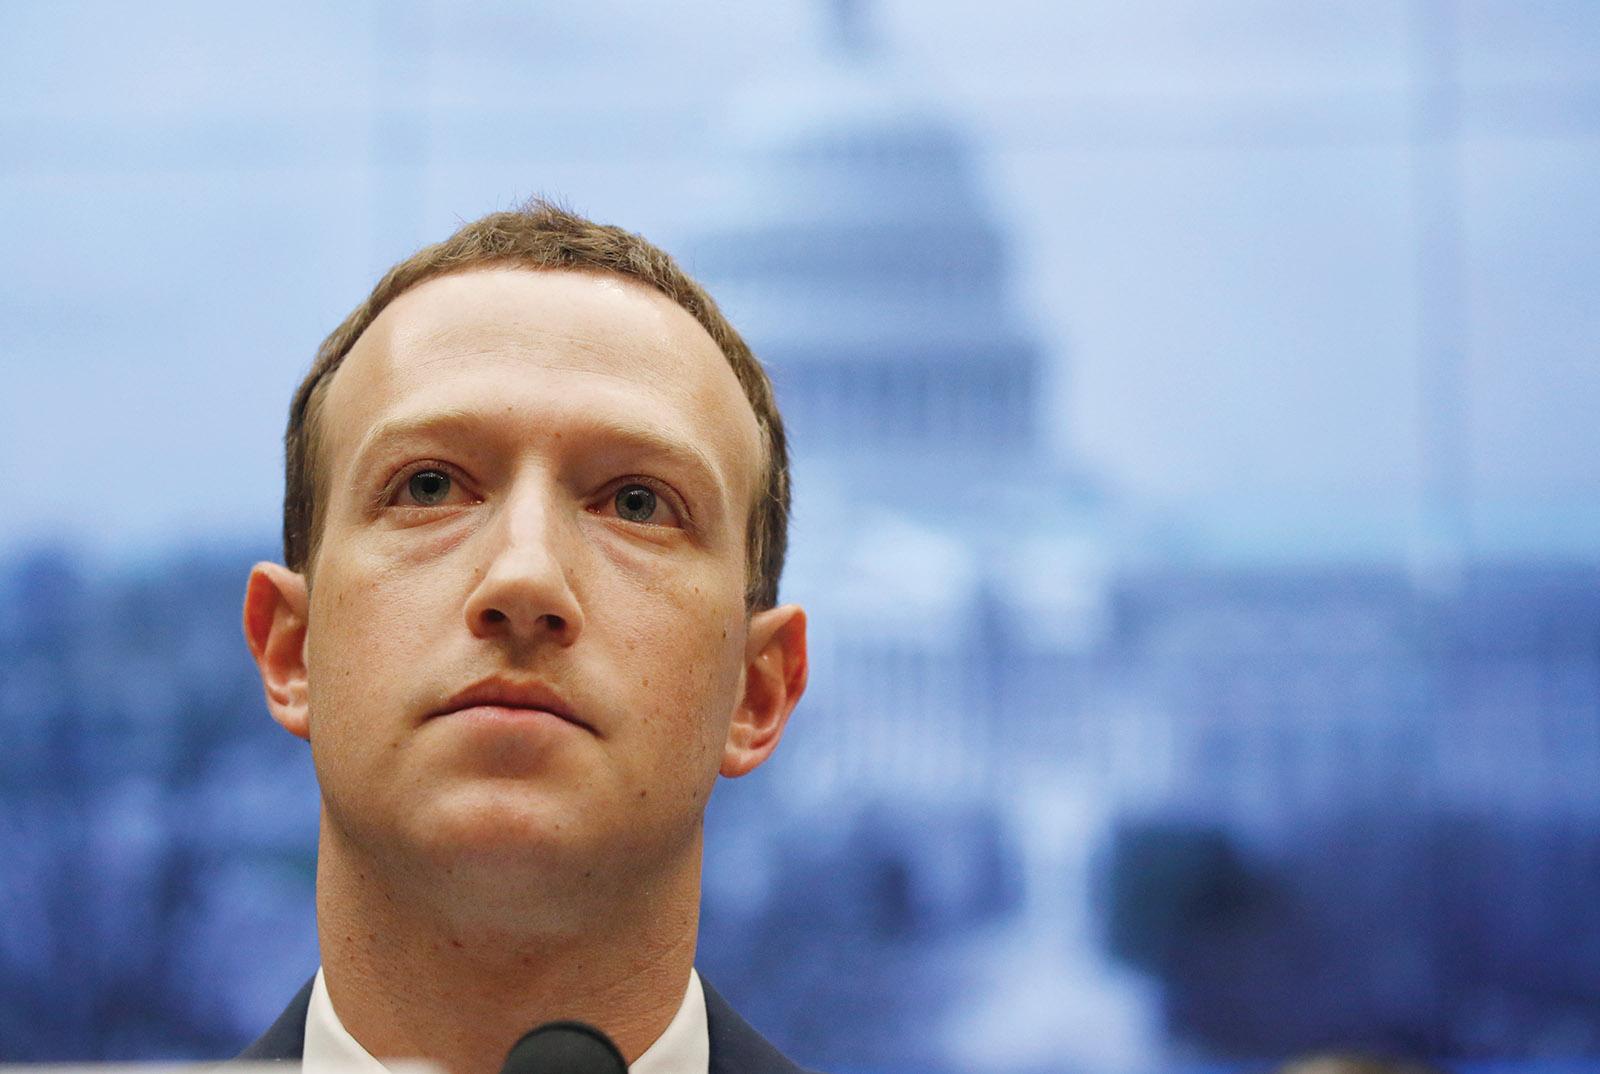 Mark Zuckerberg testifying at a Senate hearing about Facebook's use of user data, Washington, D.C., April 2018